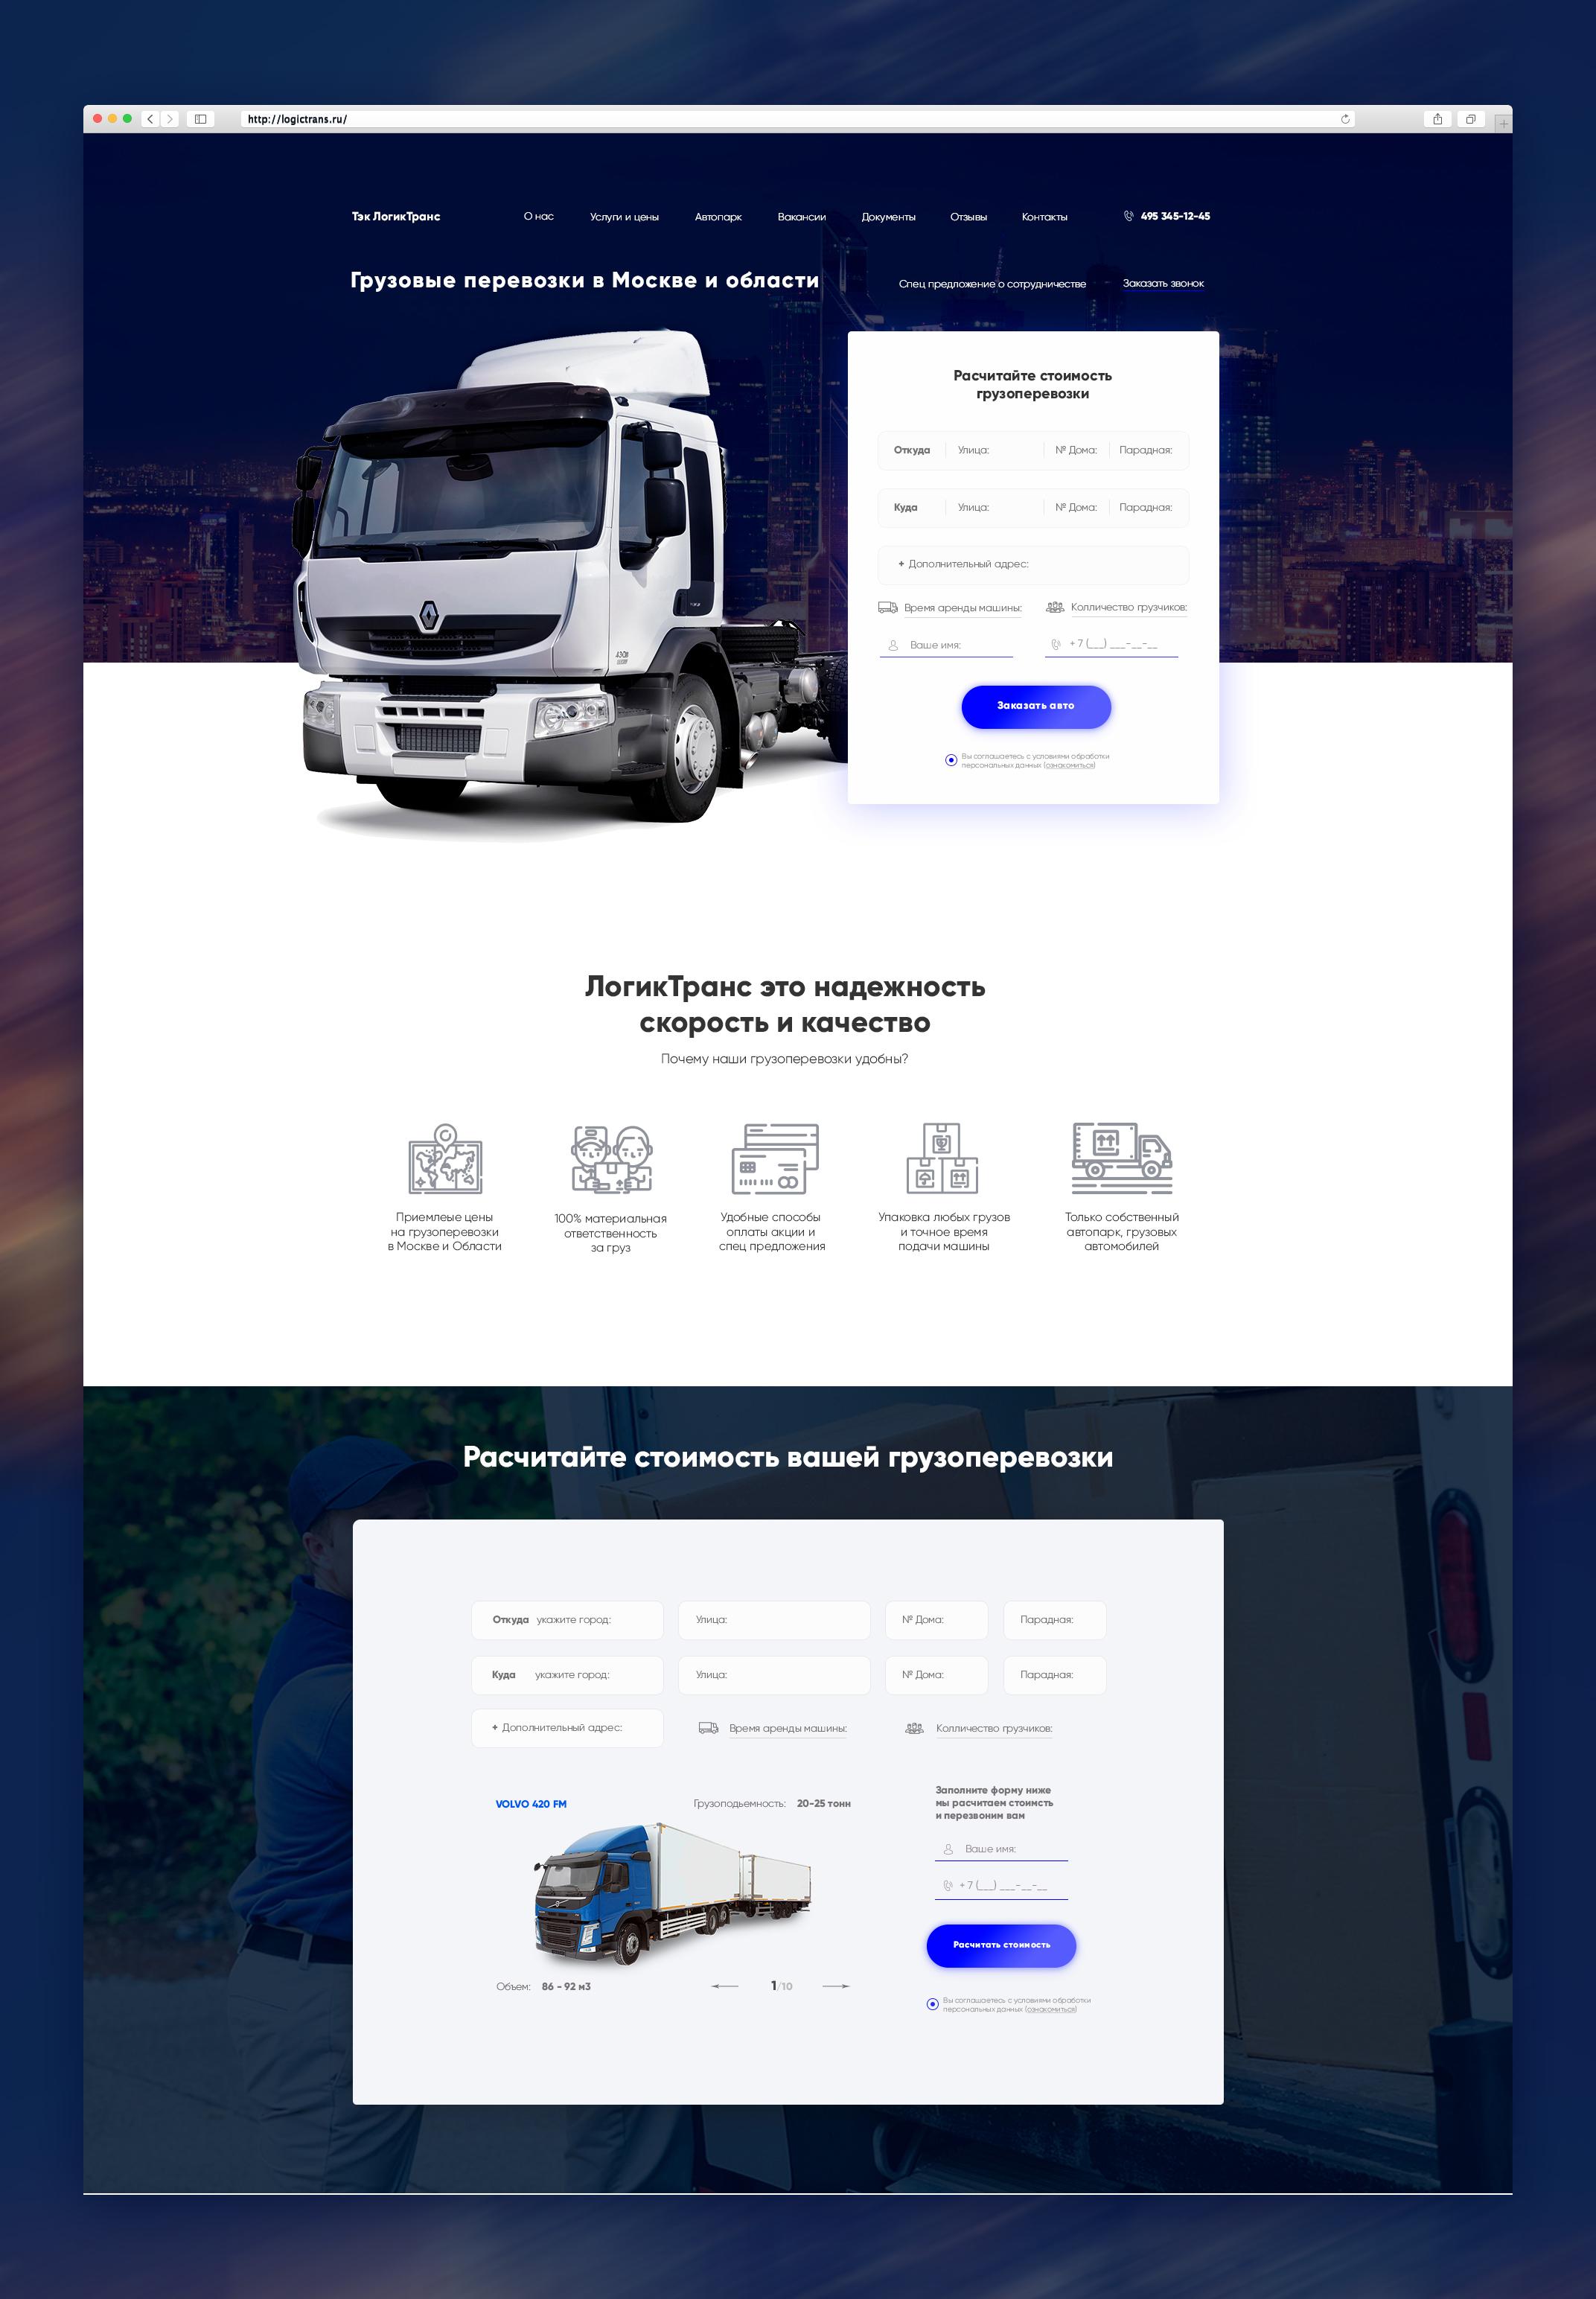 Дизайн сайта транспортно-экспедиторской компании ЛогикТранс фото f_3675a43c92063c8e.jpg